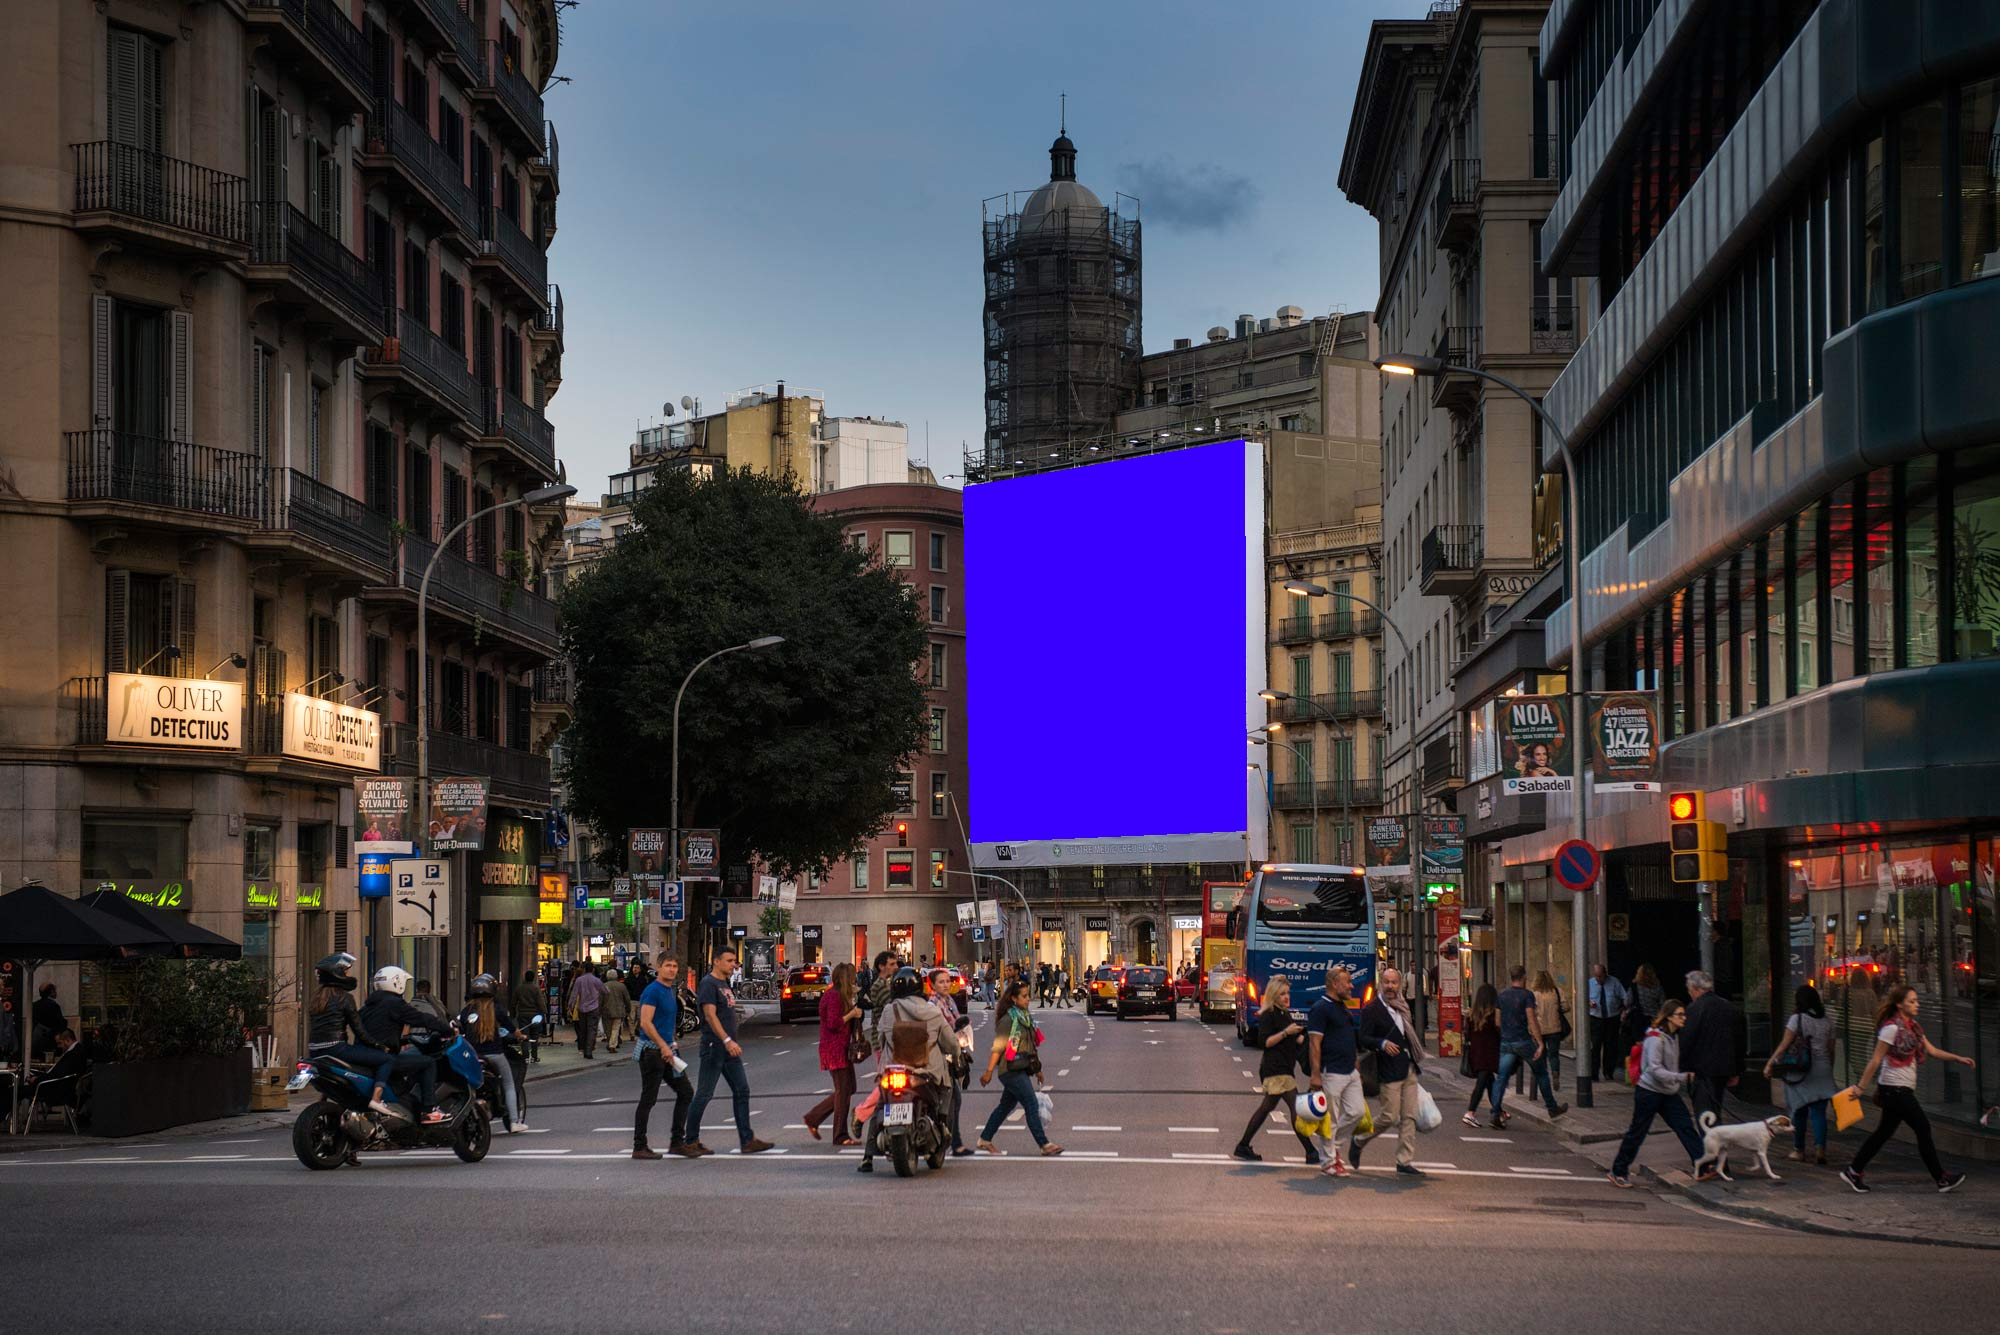 lona-publicitaria-barcelona-pelayo-frontal-faldon-azul-vsa-comunicacion